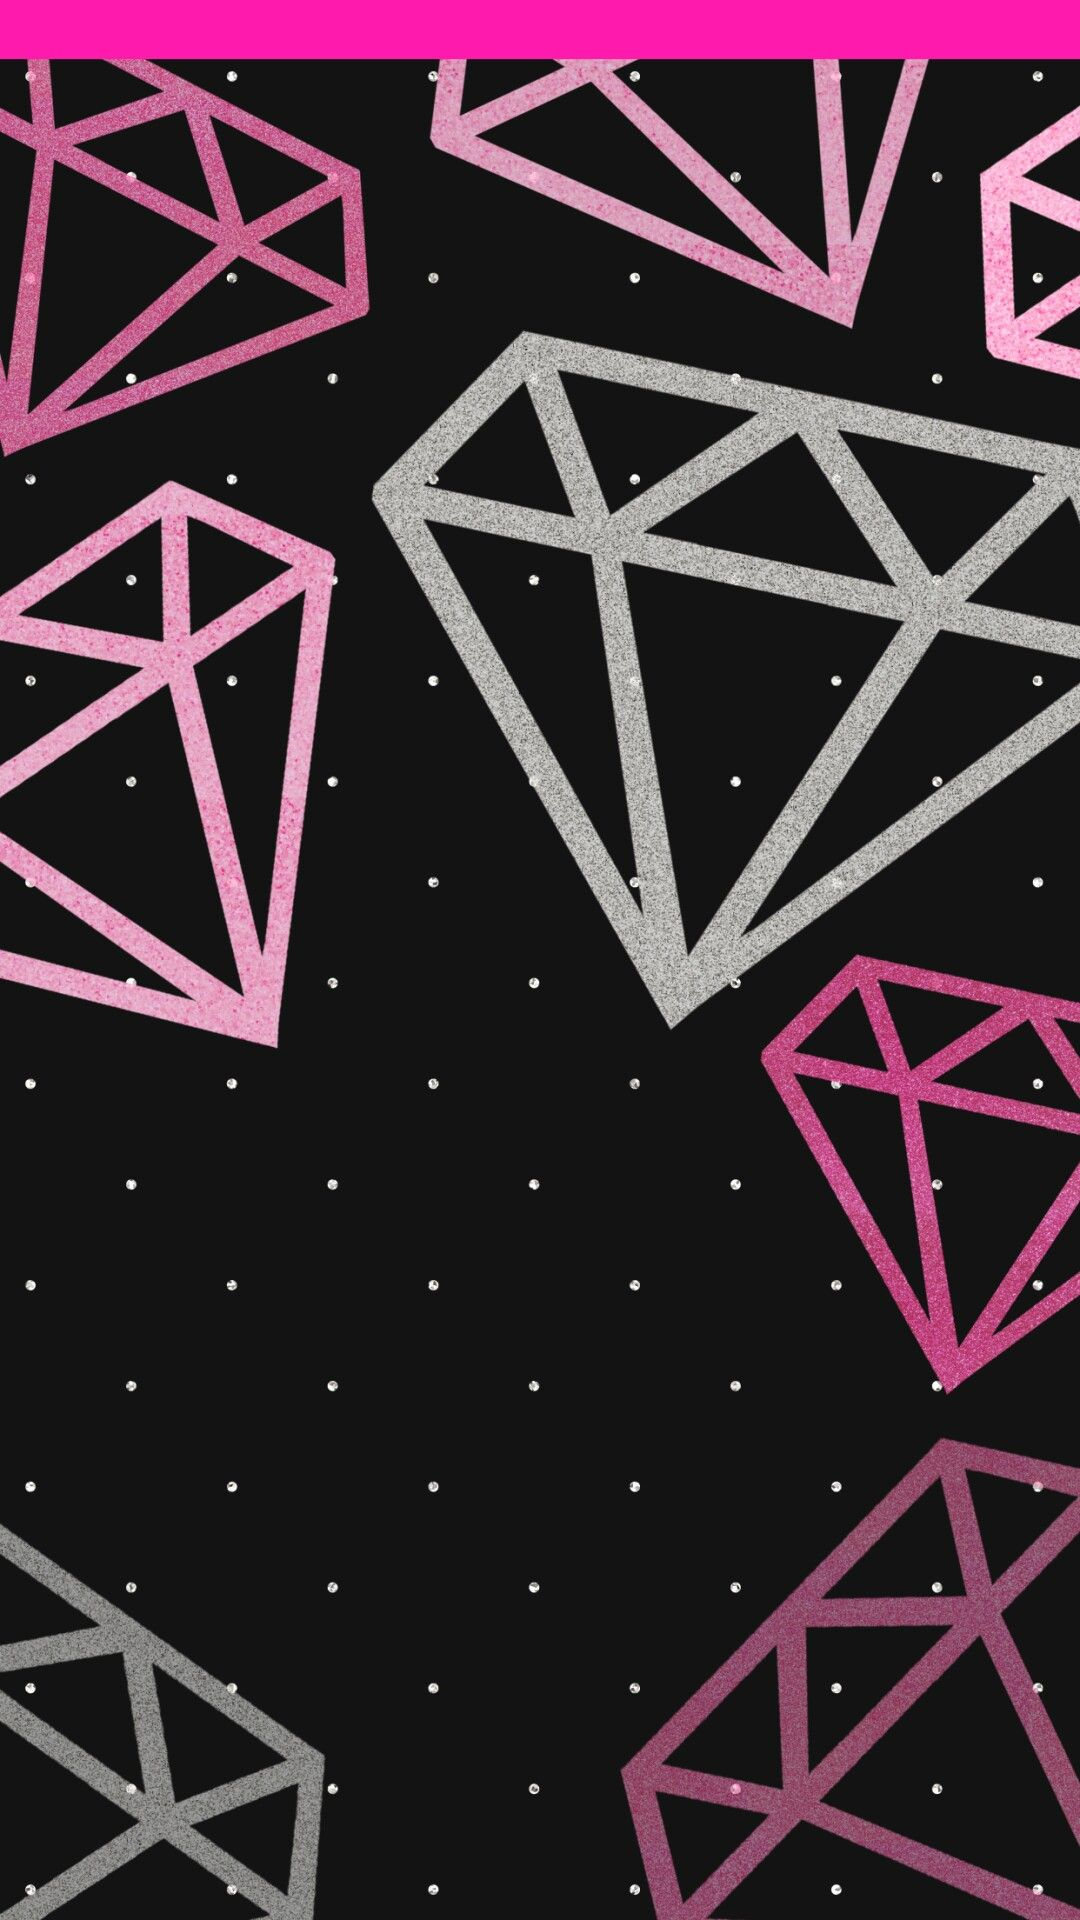 Cool Wallpaper Hello Kitty Diamond - ea394f9e0b7f127b0706e37d3afd8446  You Should Have_337935.jpg